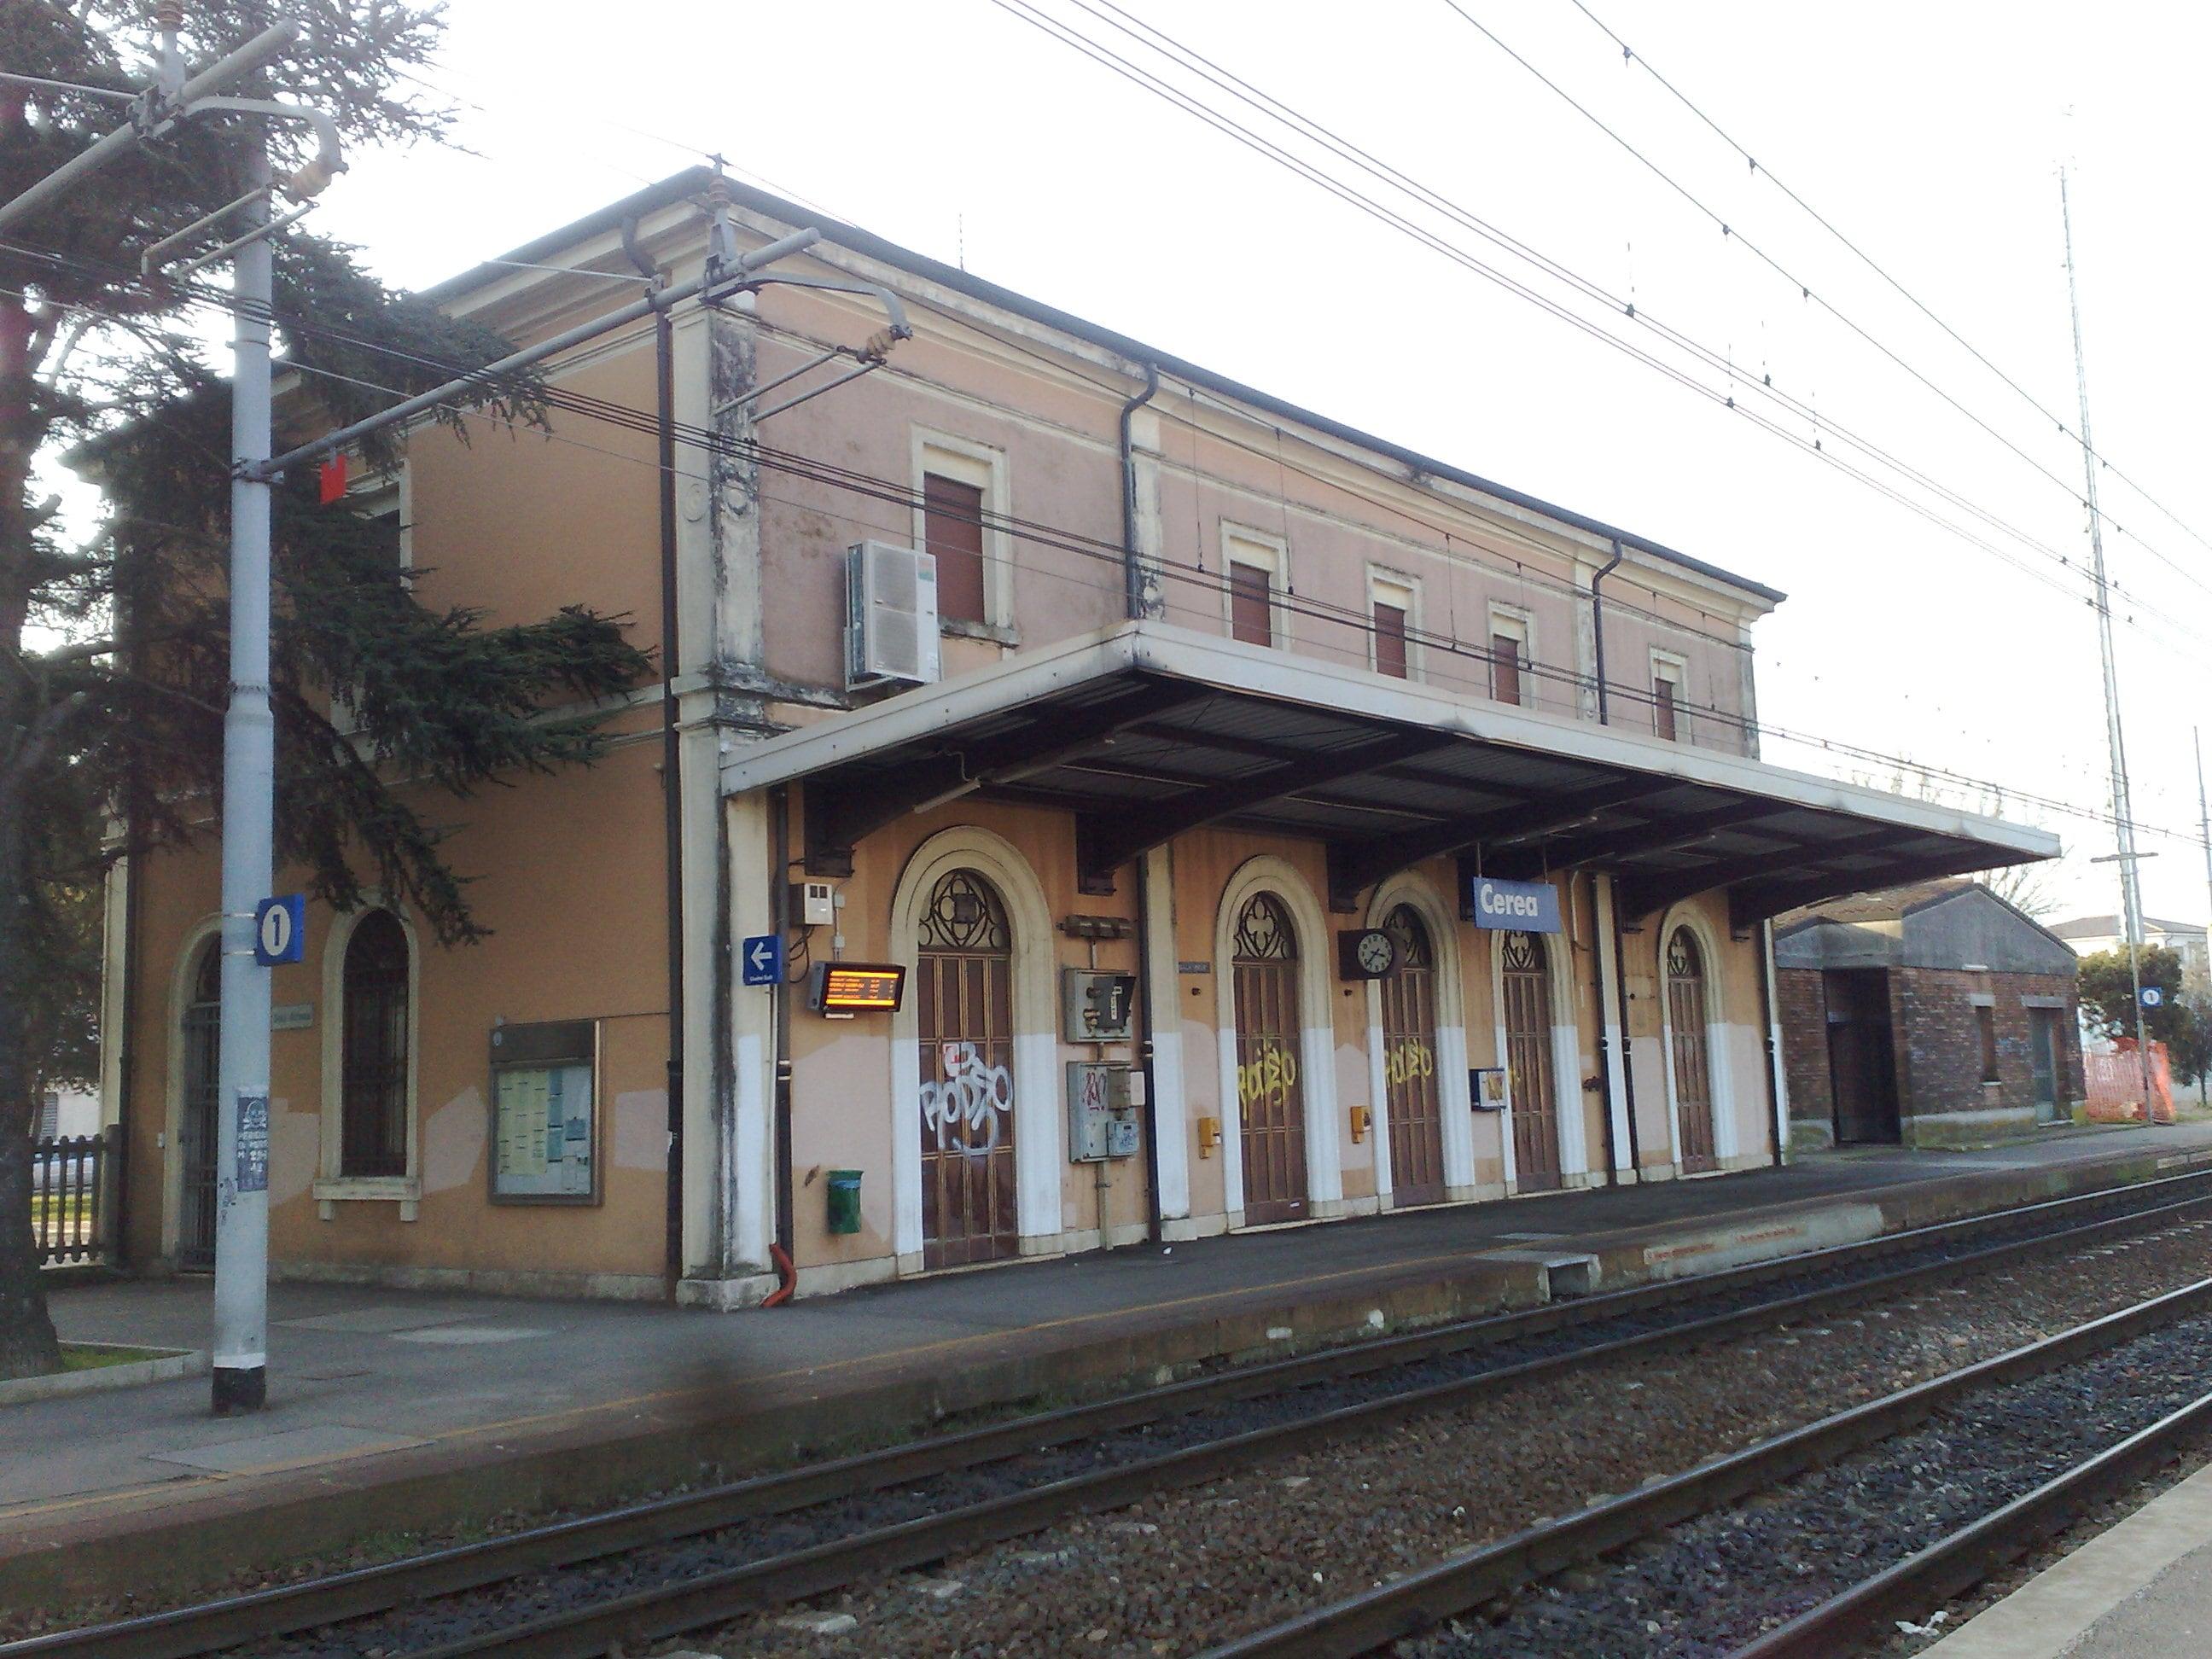 Verona Rom